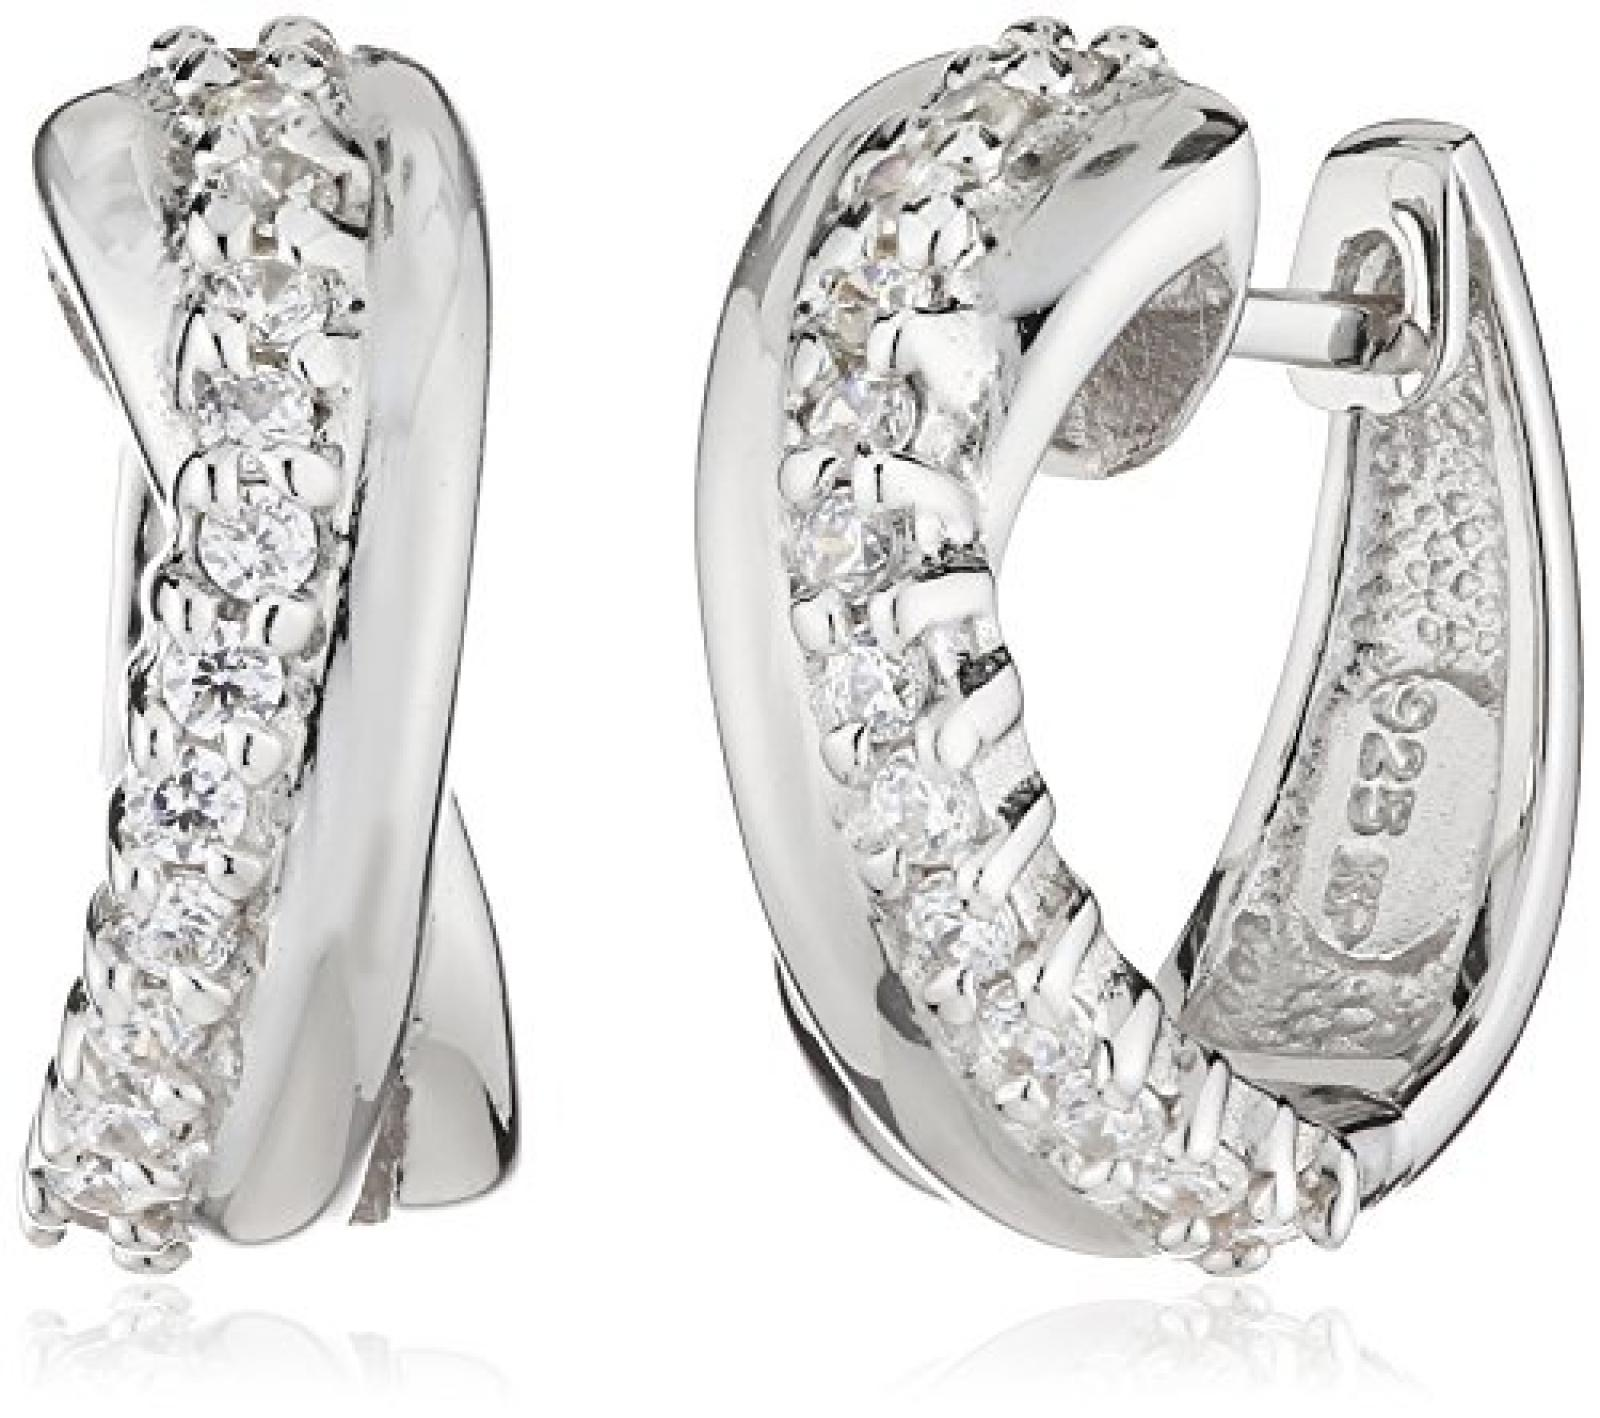 Celesta Damen-Creolen 925/- Sterling Silber, Zirkonia Weiß, 360210153